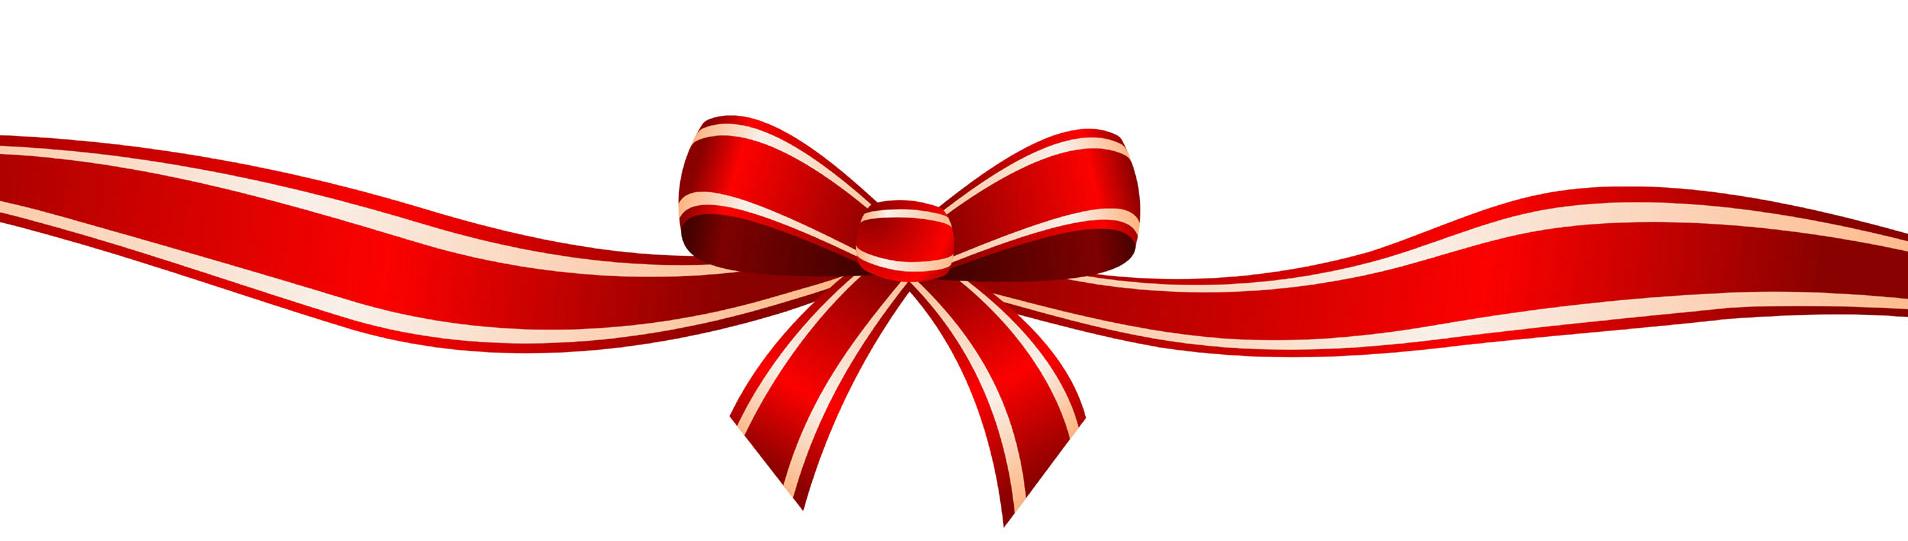 Holydays clipart ribbon KB 1494x736px 26 Ribbon #315791